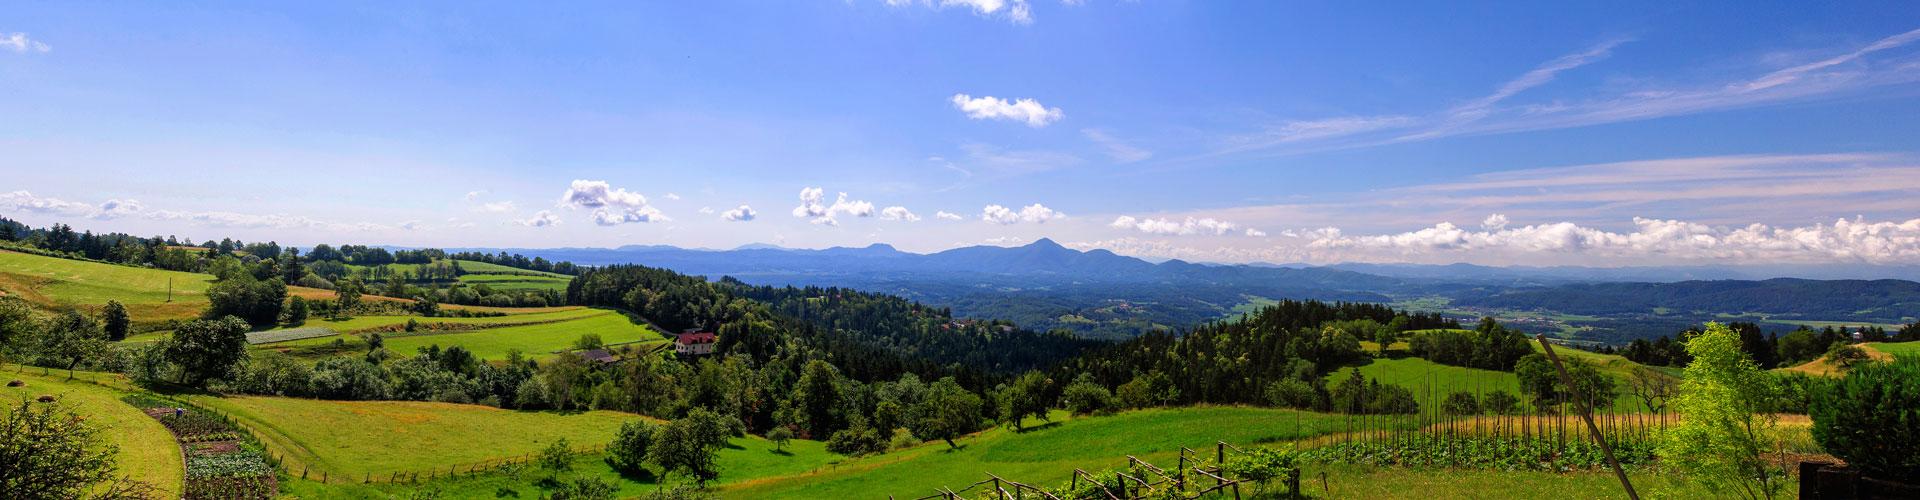 zeleni-dragul-kebelj-panorama